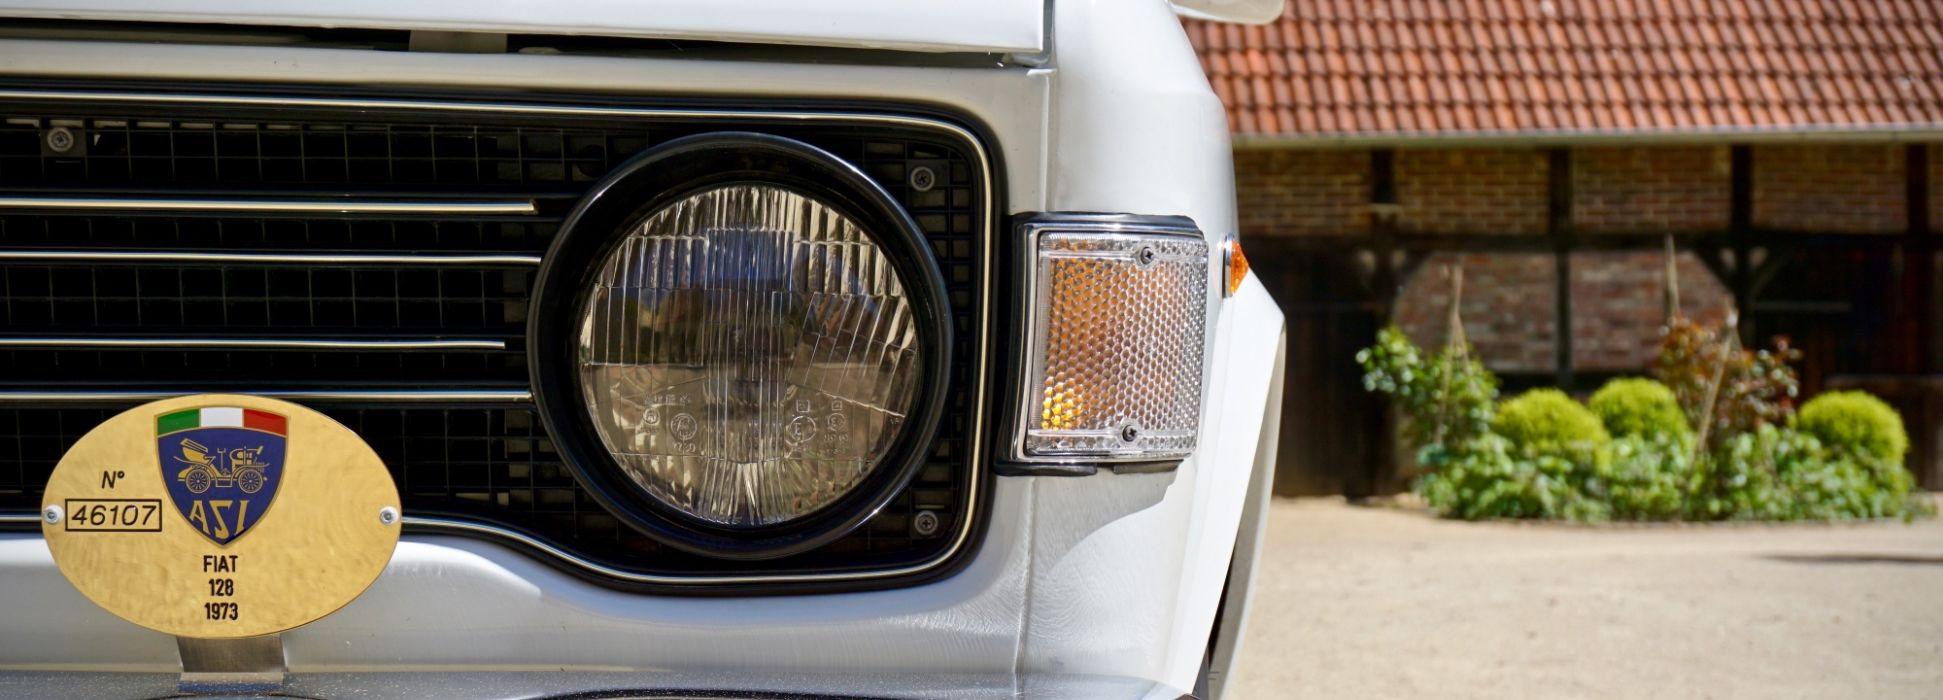 Fiat 128 Berlina 25